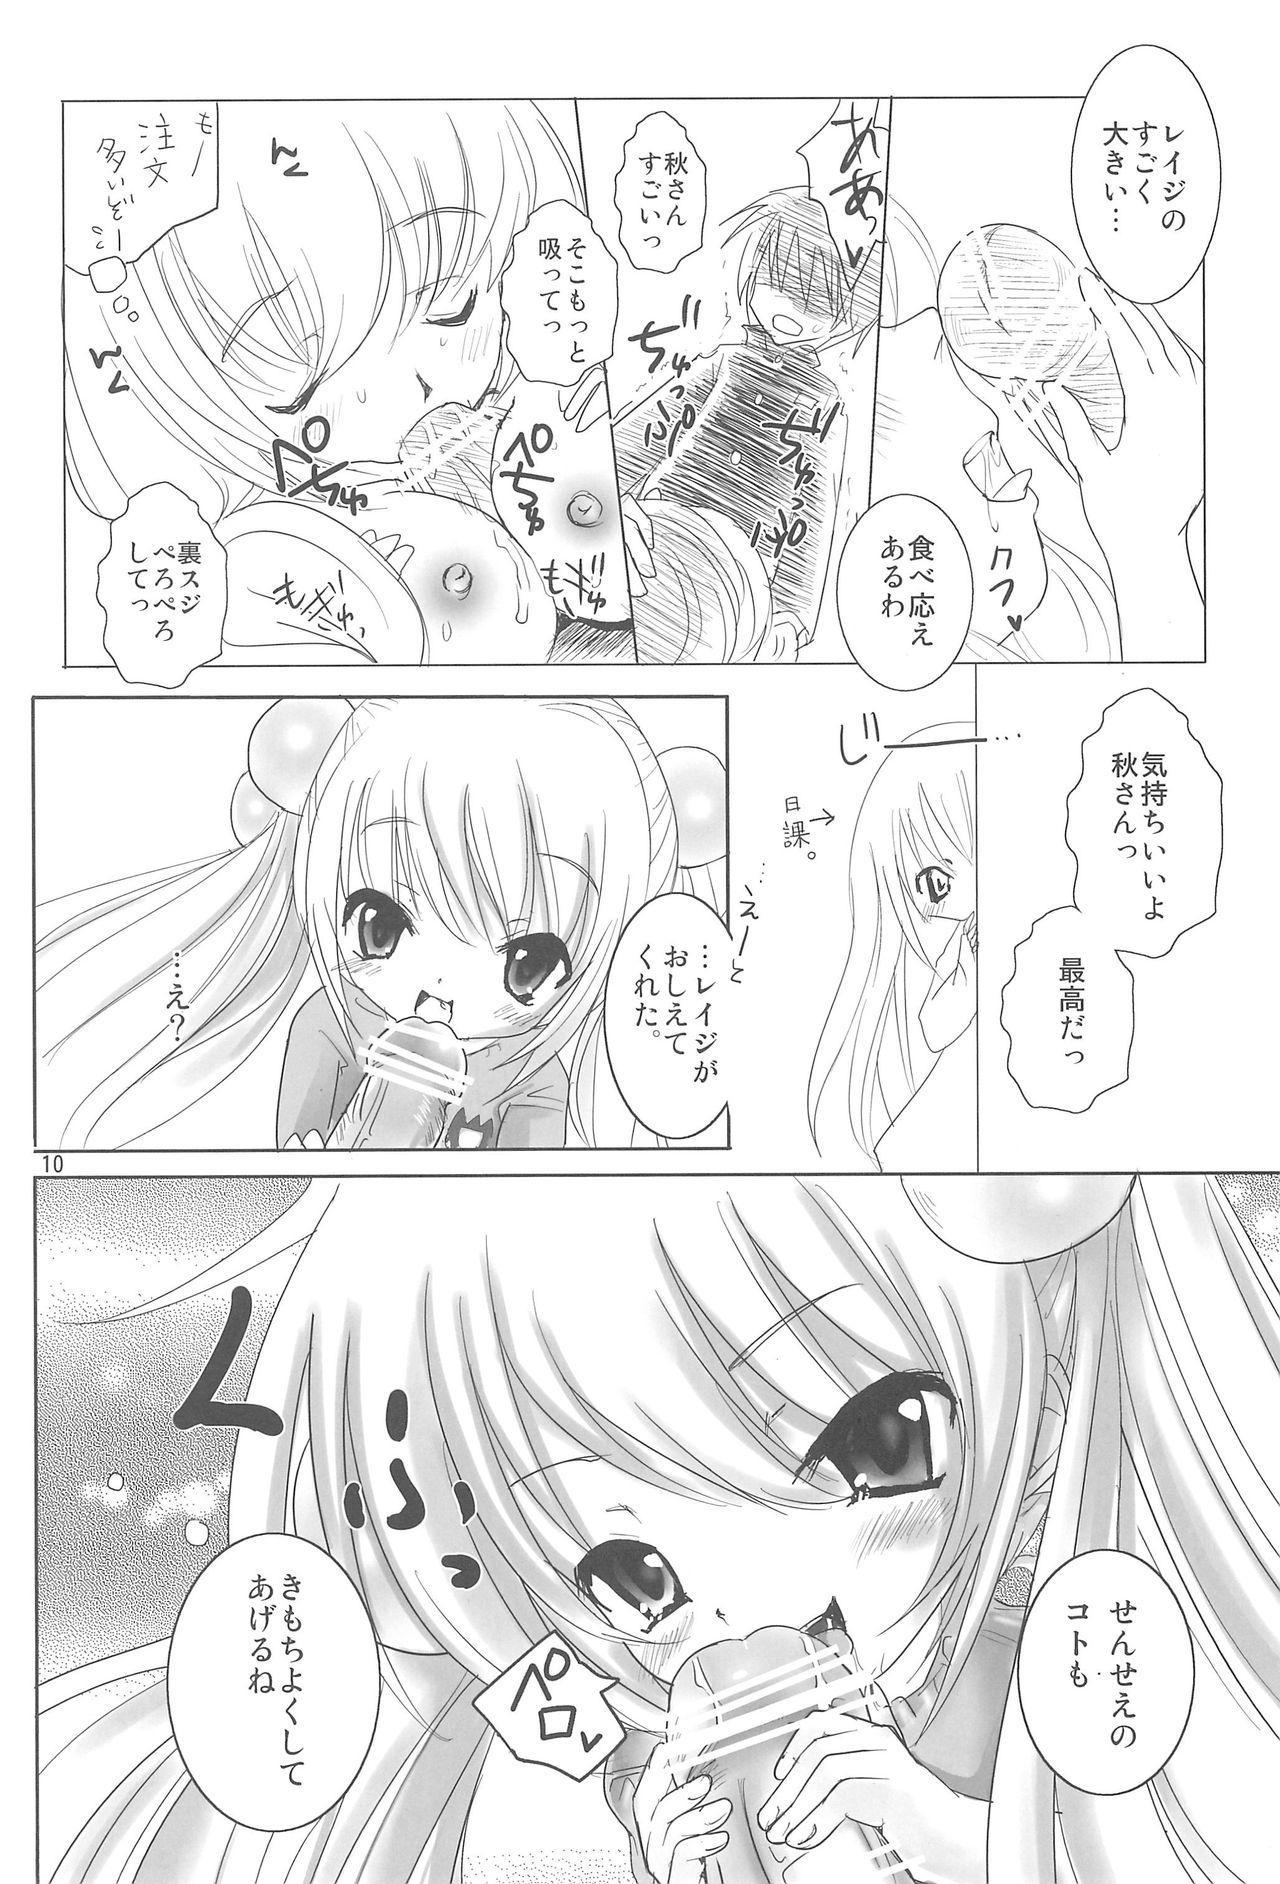 Crayon Rin-chan 8